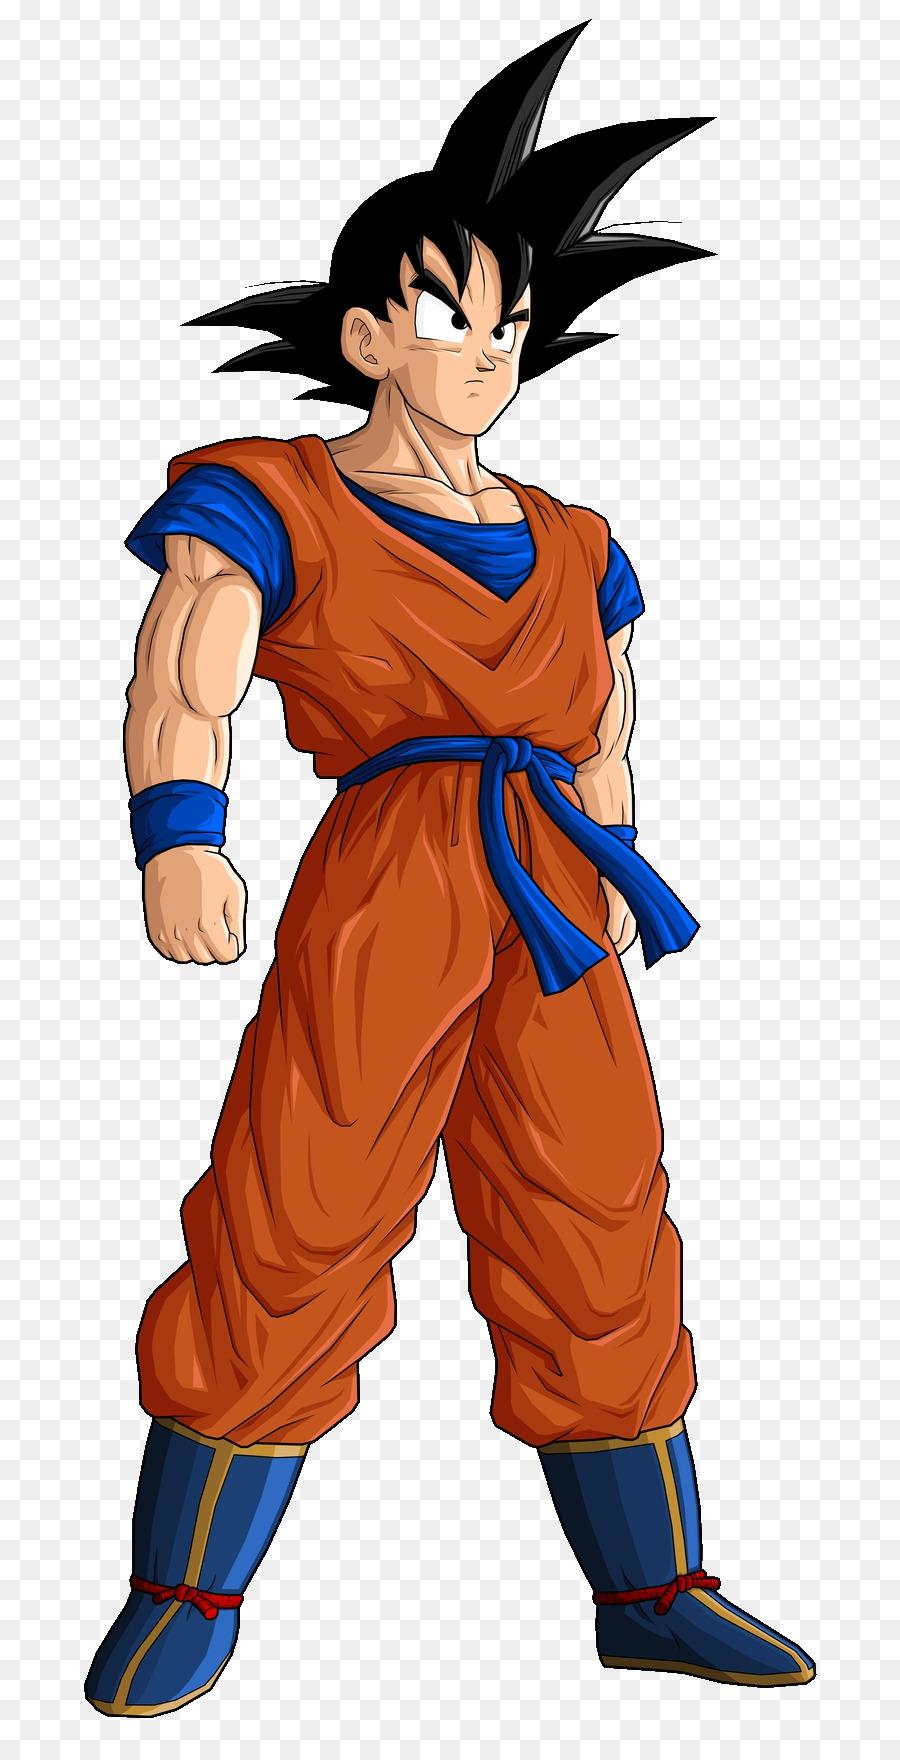 Goku vegeta gohan dragon ball z akira toriyama son png - Son goku vegeta ...